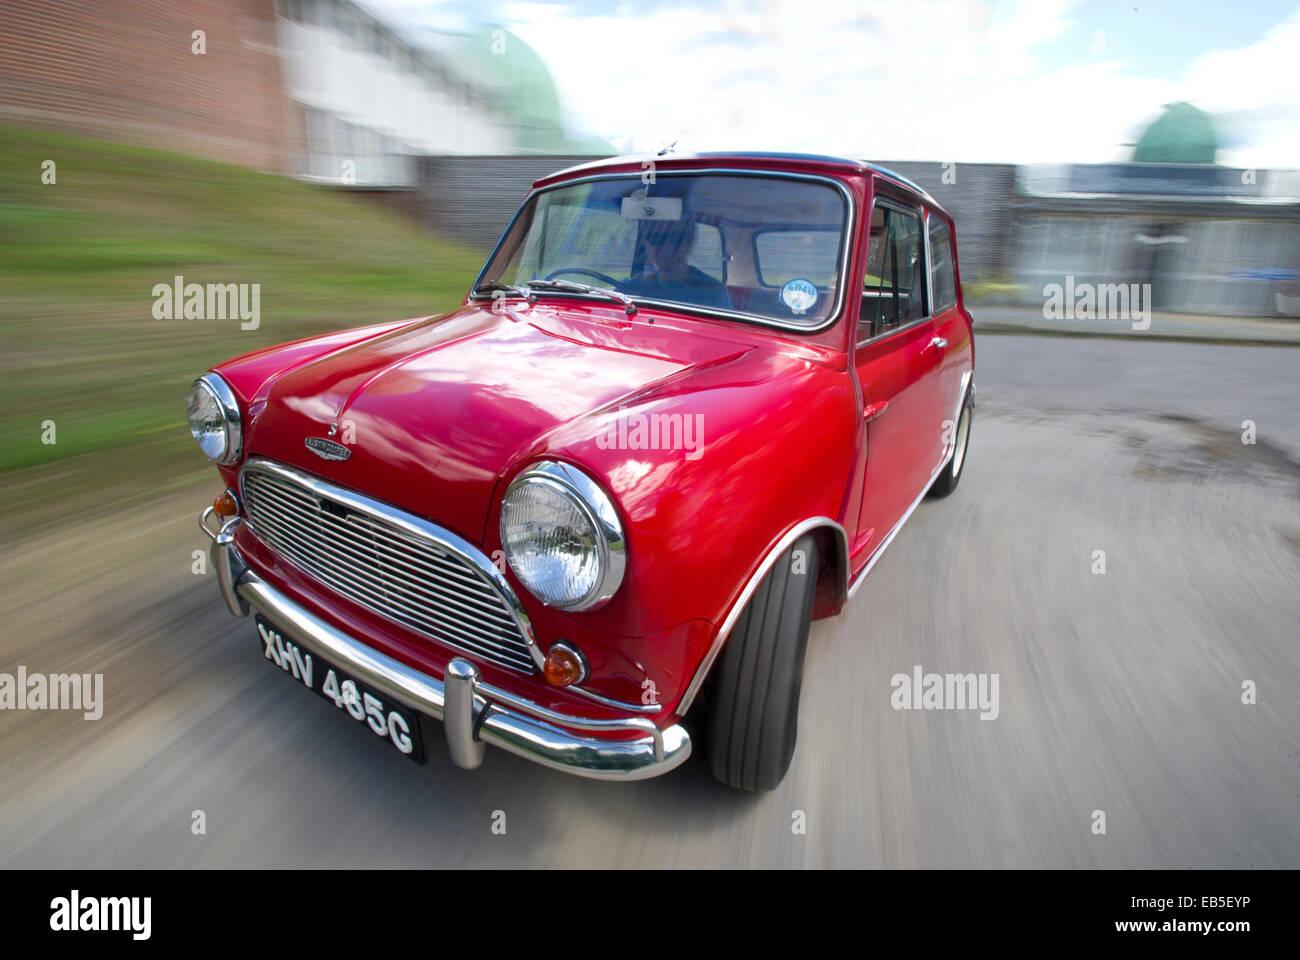 1968 Austin Mini Cooper S rig shot - Stock Image